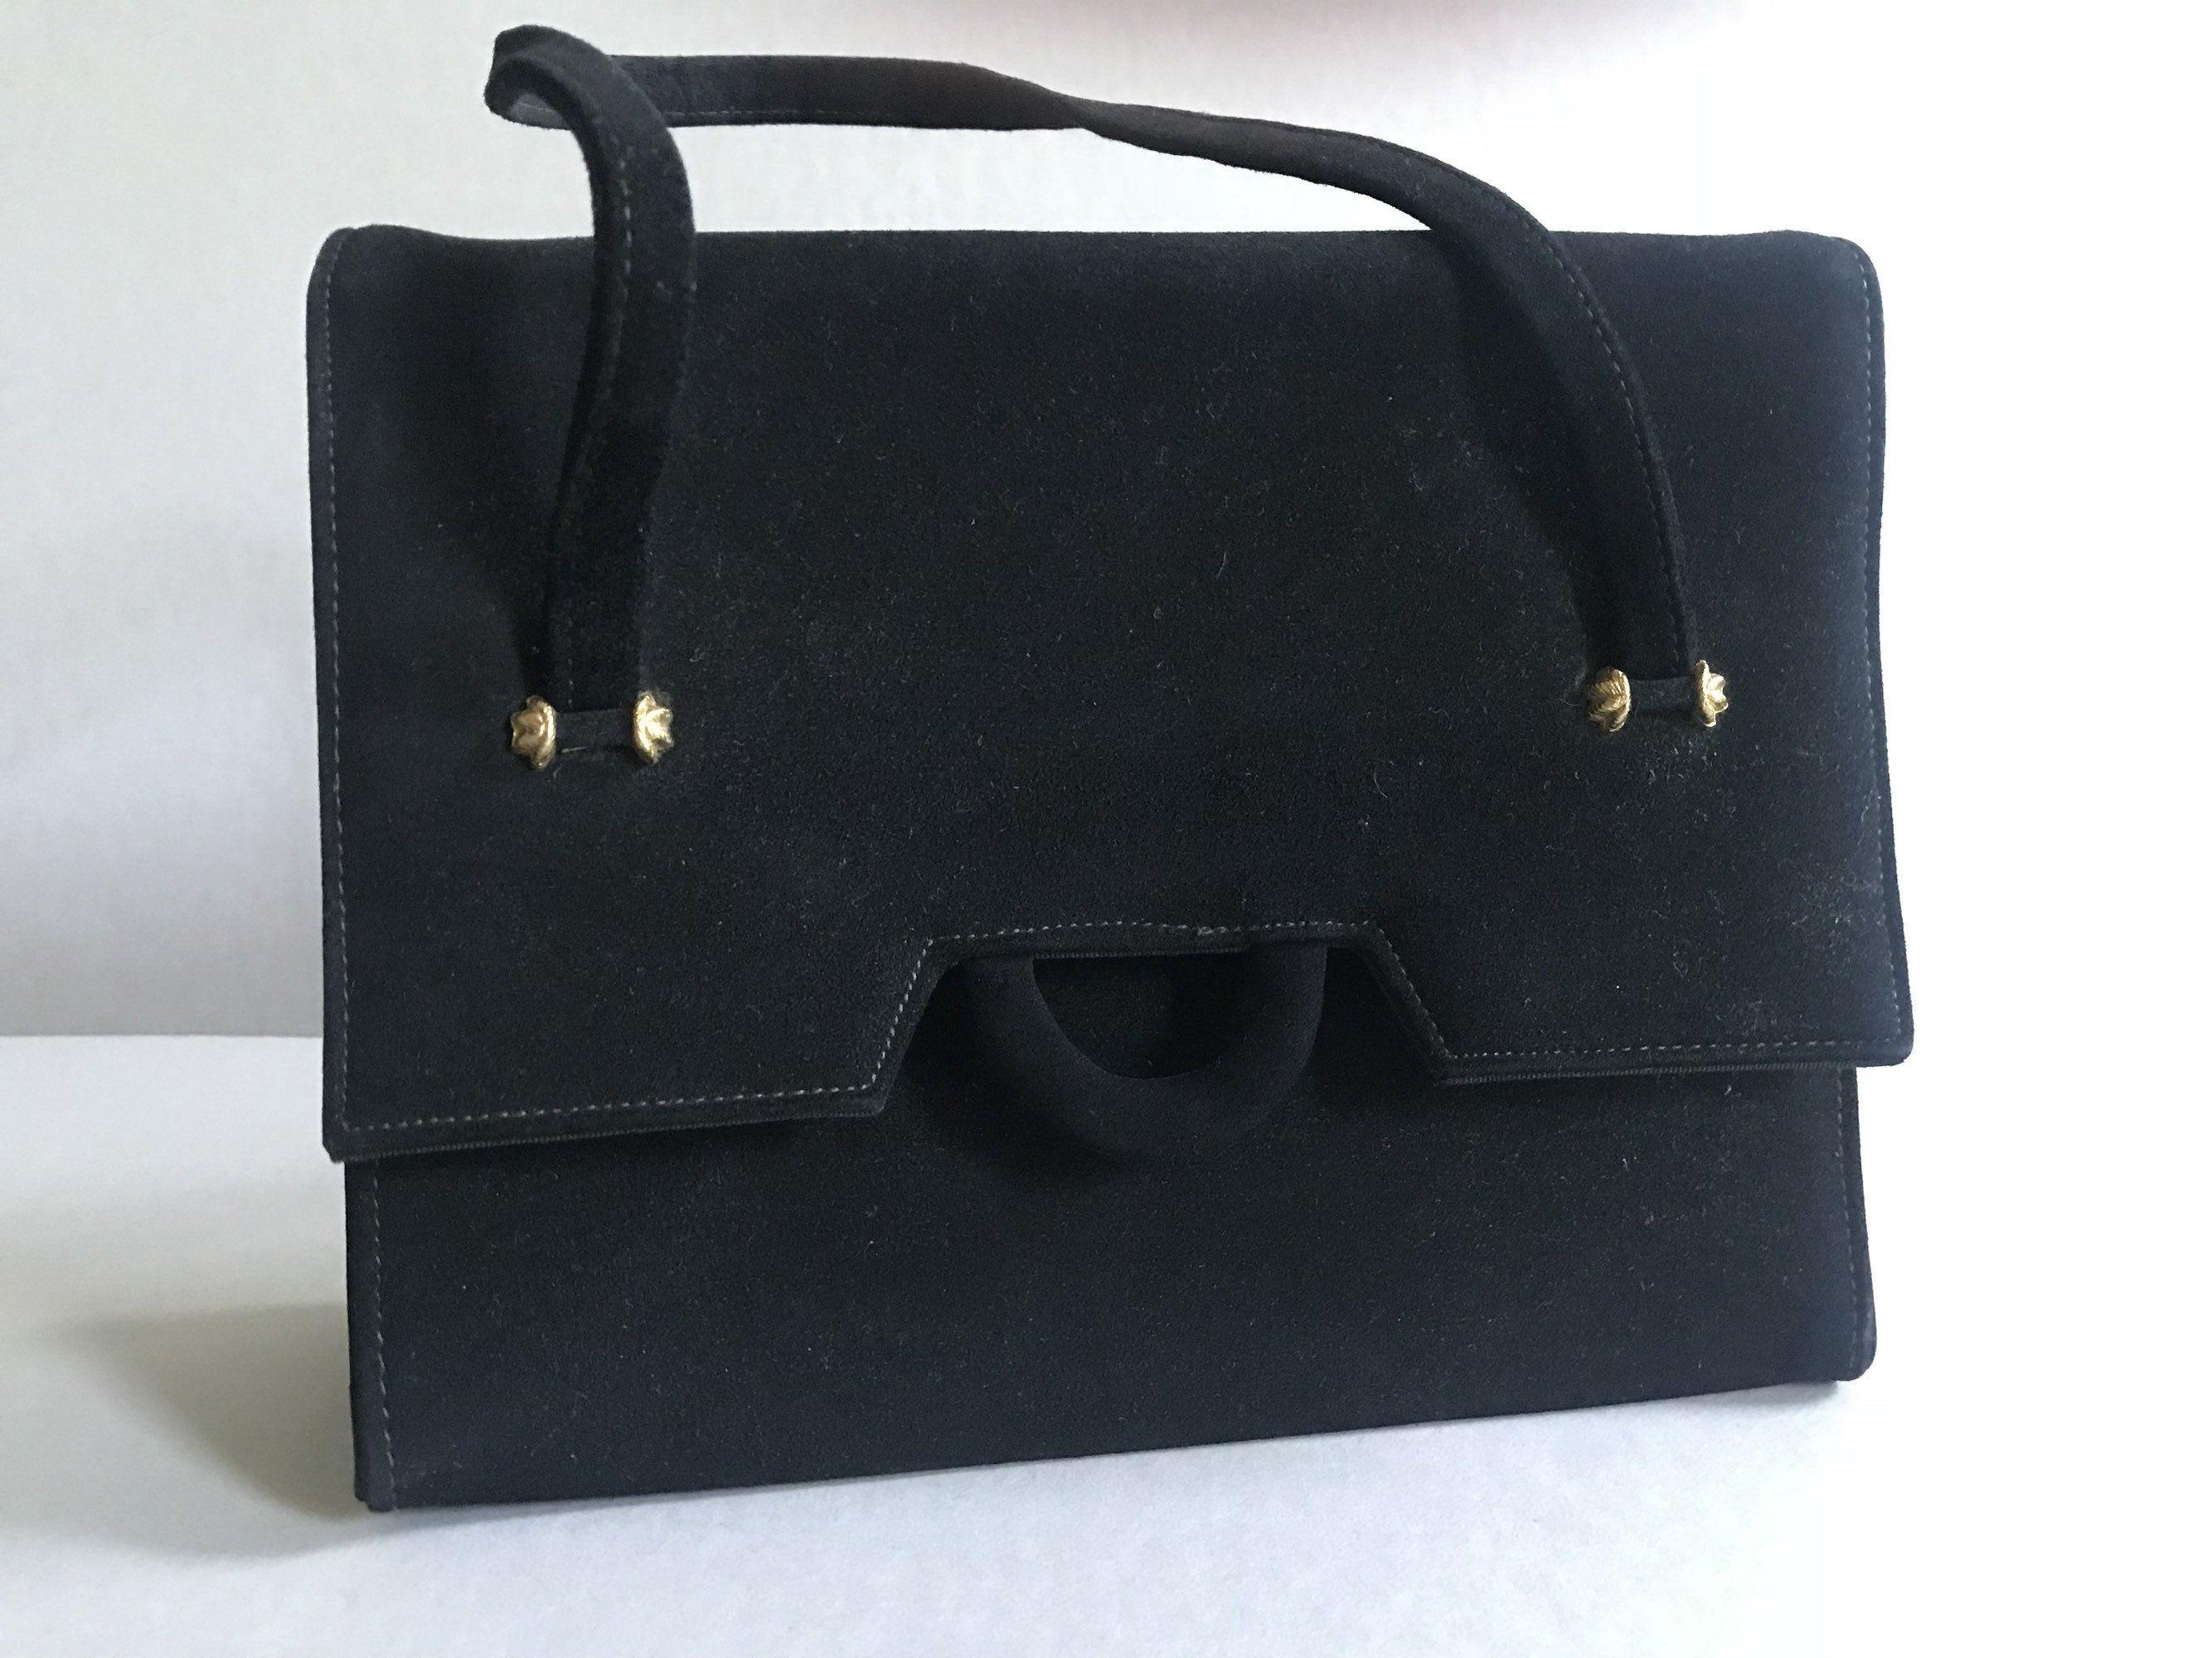 878311480ef0 BLOCK Handbag Black Velours Velvet Vintage Purse 1960s Accessory by  BROCANTEBedStuy on Etsy